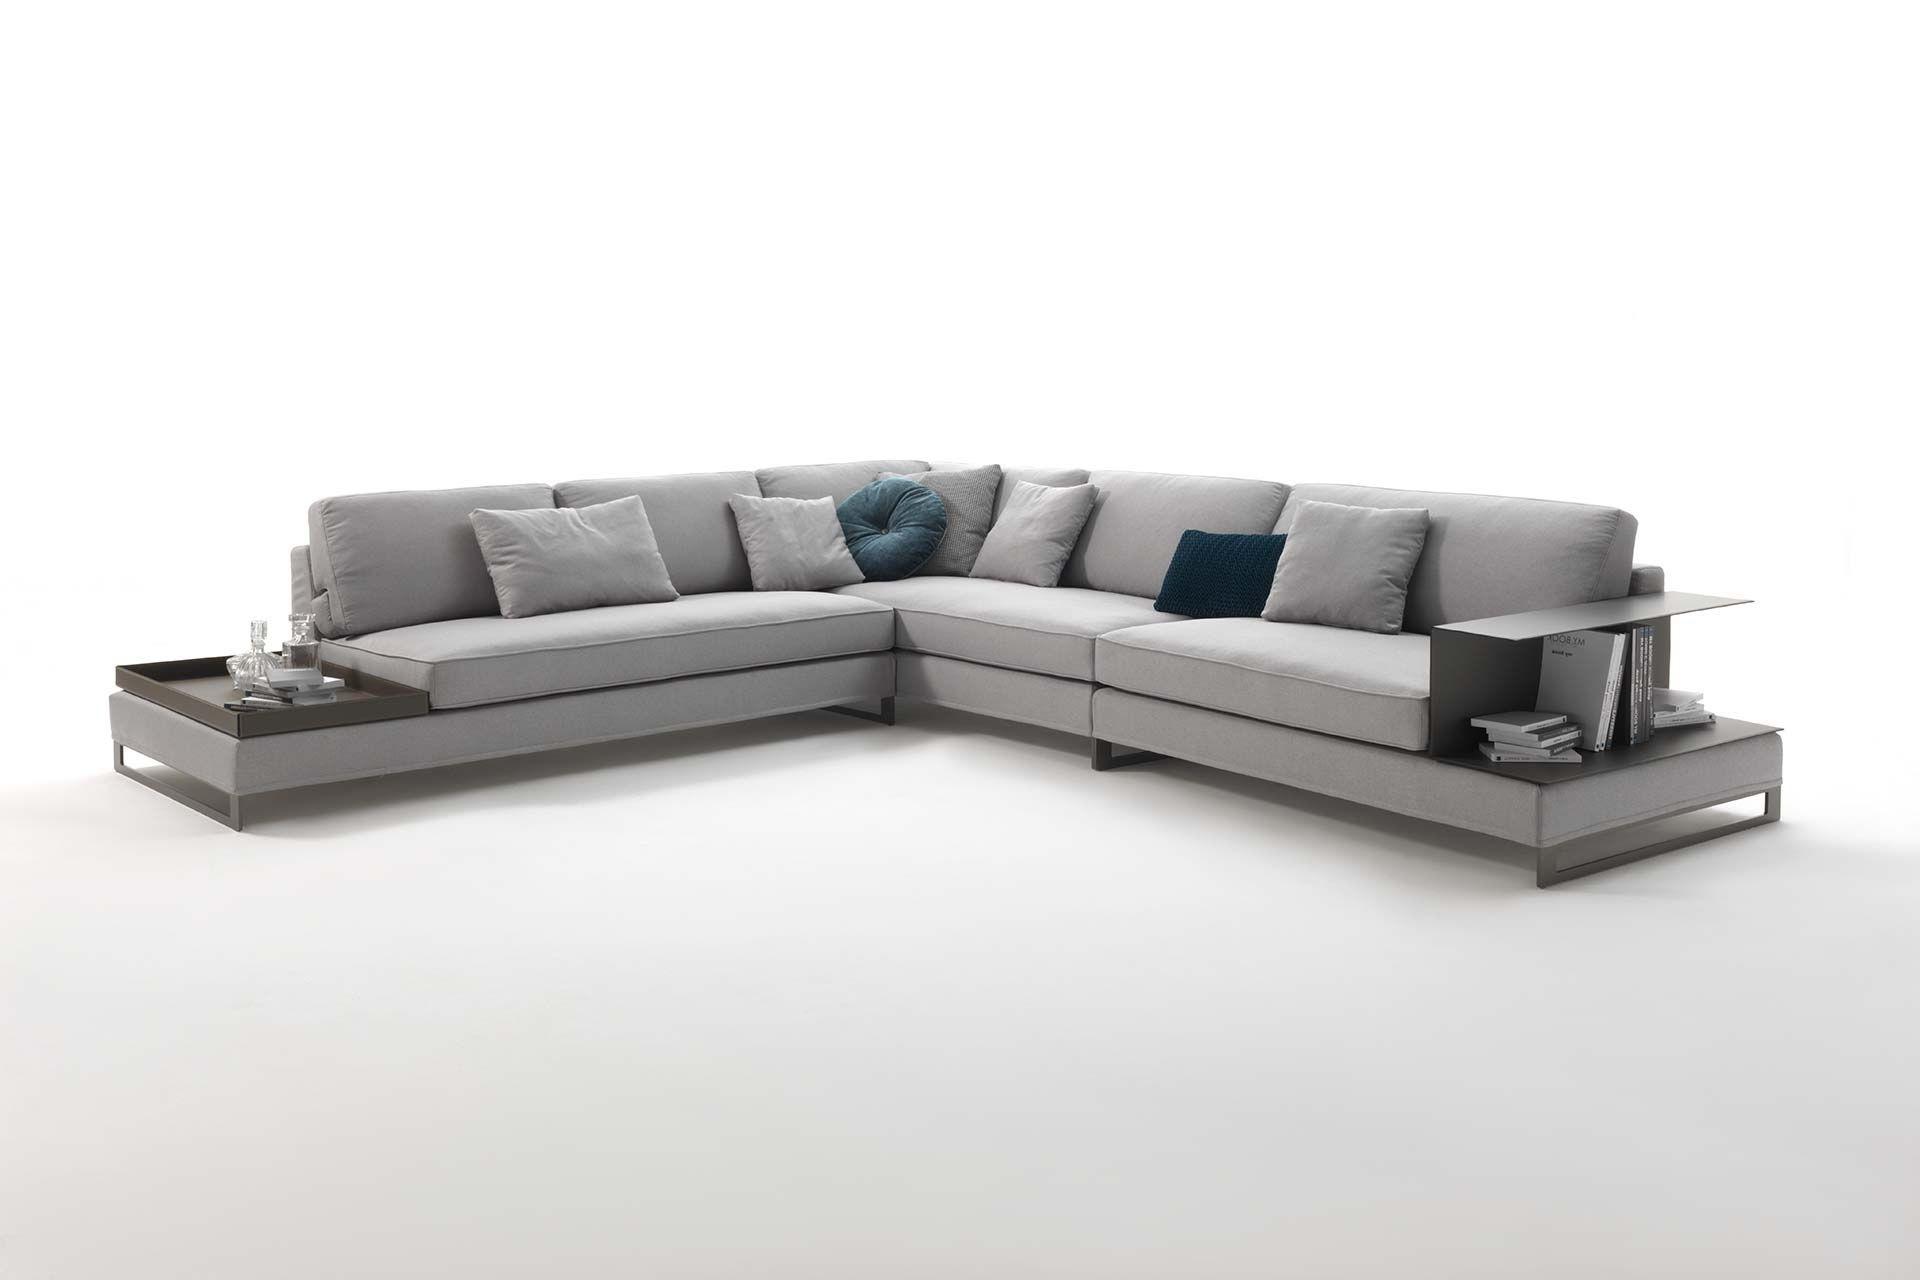 Contemporary Fabric Sofas Regarding Famous Modular Sofa / Contemporary / Fabric / Leather – Davis Case (View 12 of 15)